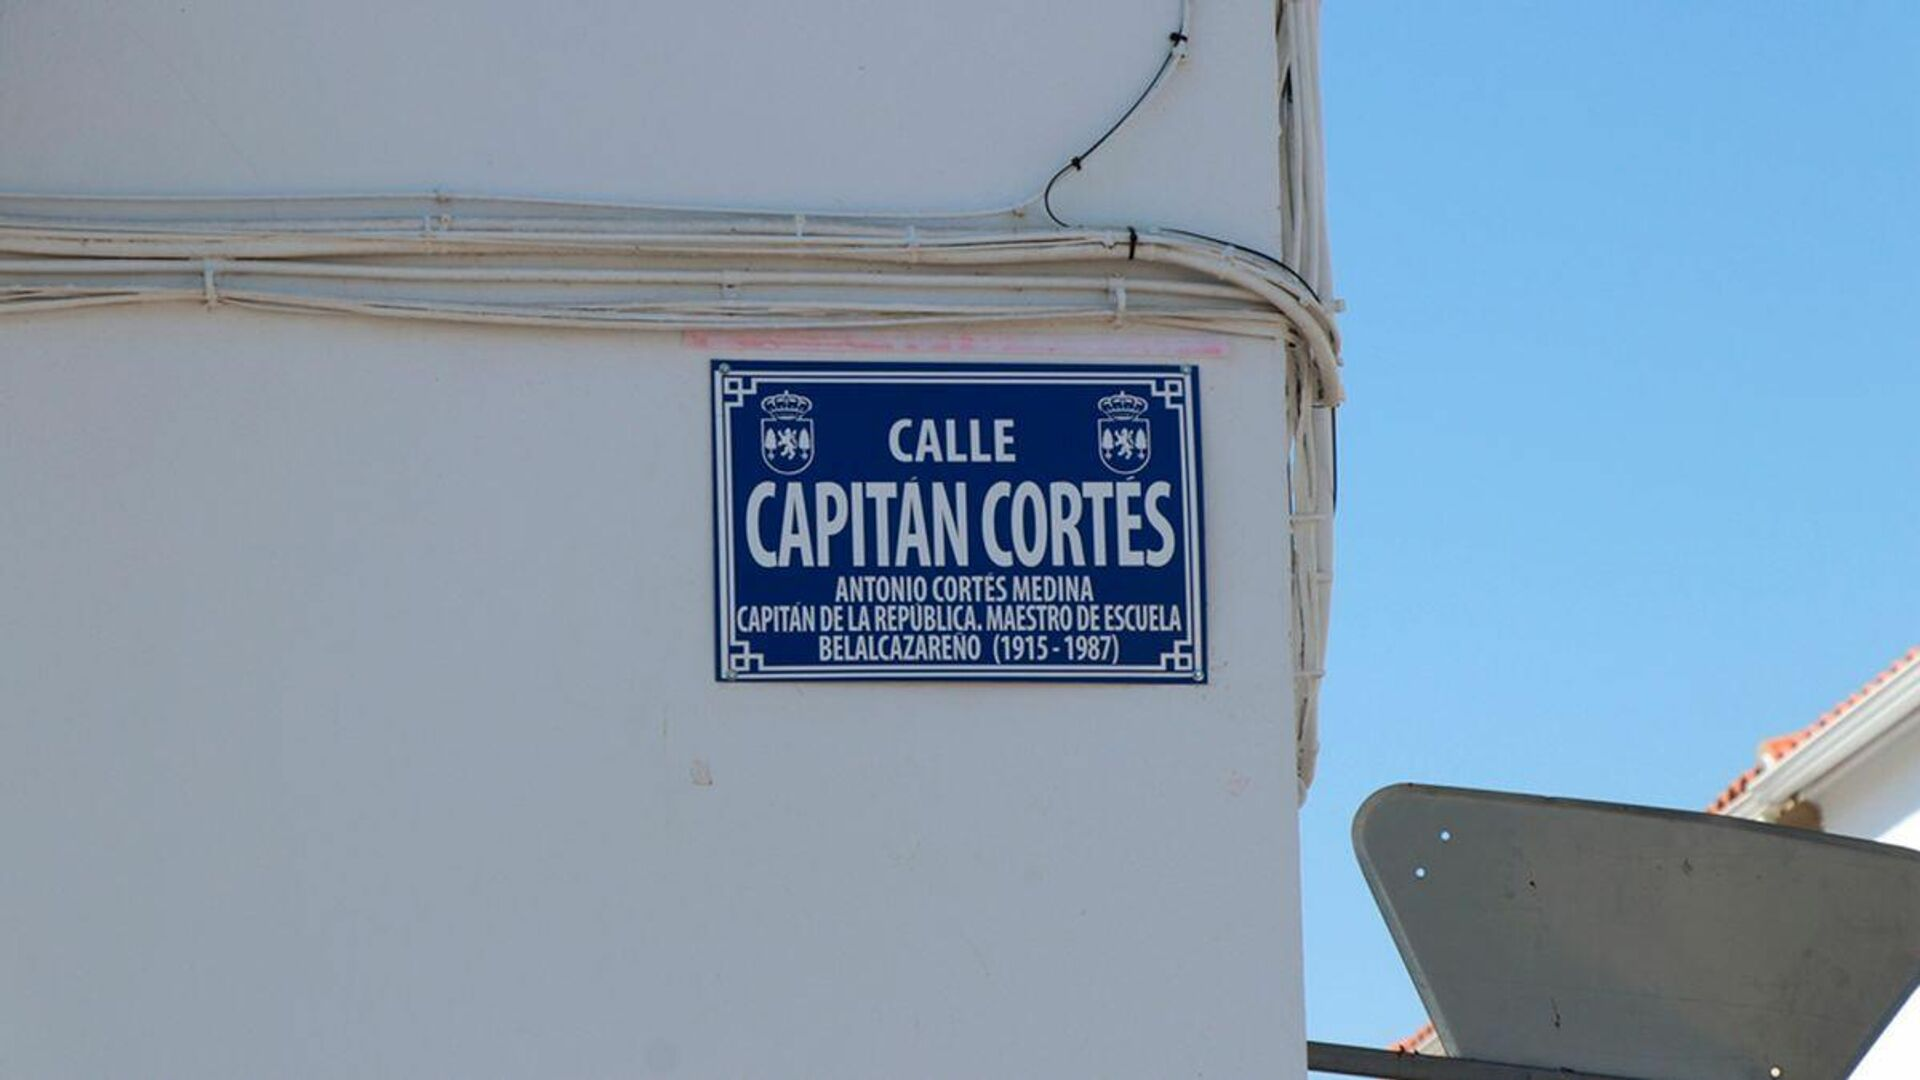 Placa de la calle Capitán Cortés (Belalcázar, Córdoba)  - Sputnik Mundo, 1920, 24.03.2021